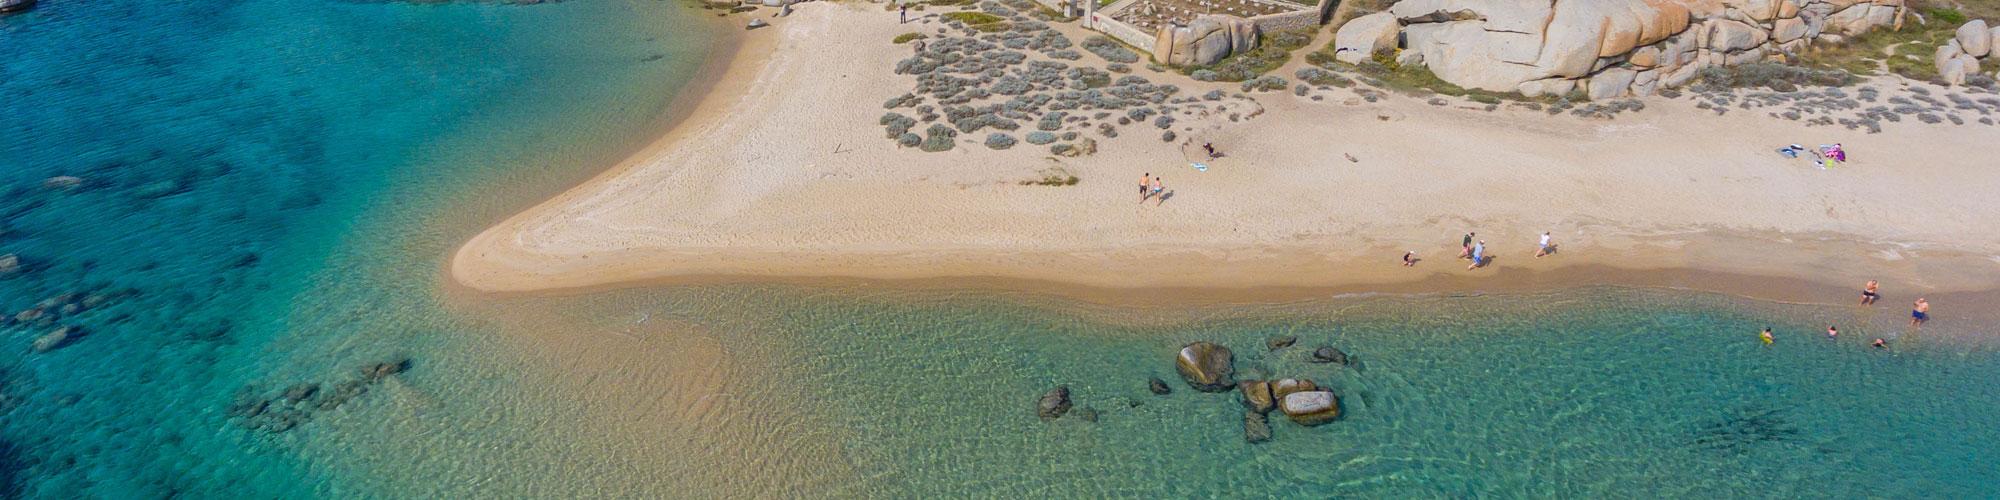 Paradisu-Korsika-08